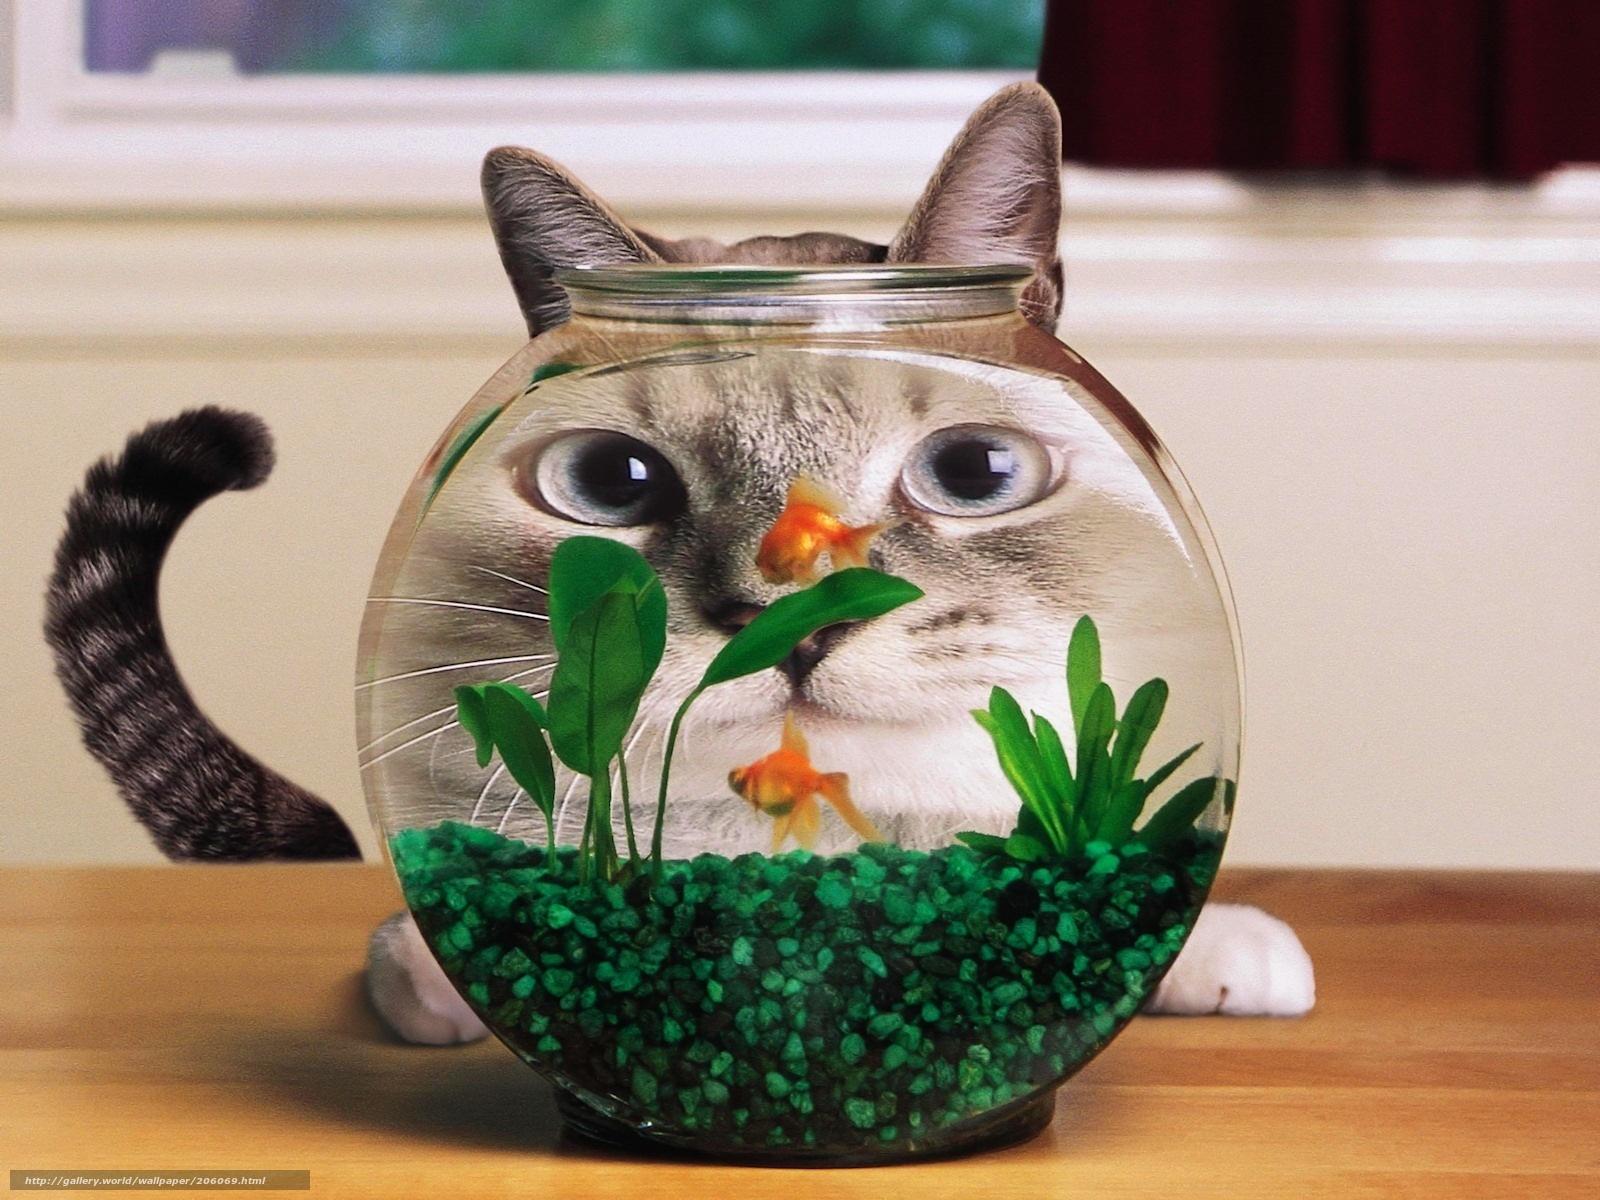 Fish in aquarium desktop wallpaper - Download Wallpaper Cat Aquarium Small Fish Free Desktop Wallpaper In The Resolution 1600x1200 Picture 206069